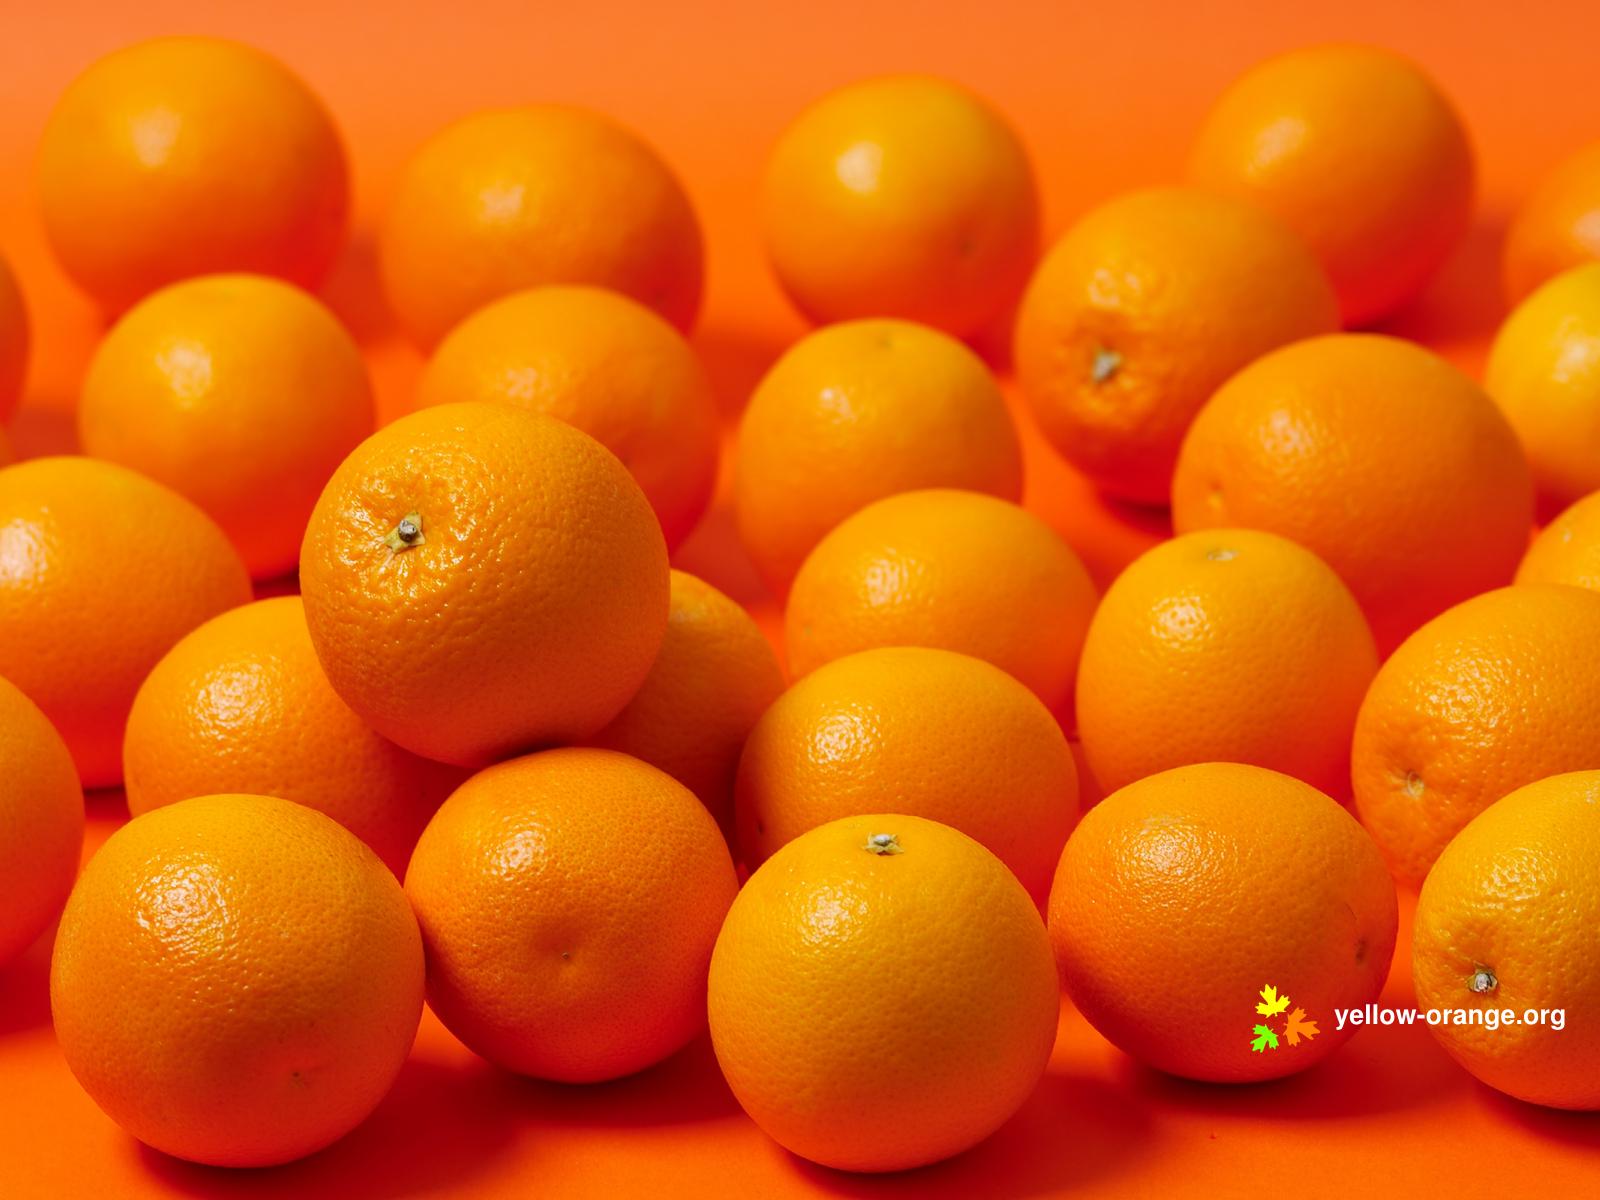 fruit food orange (fruit) orange